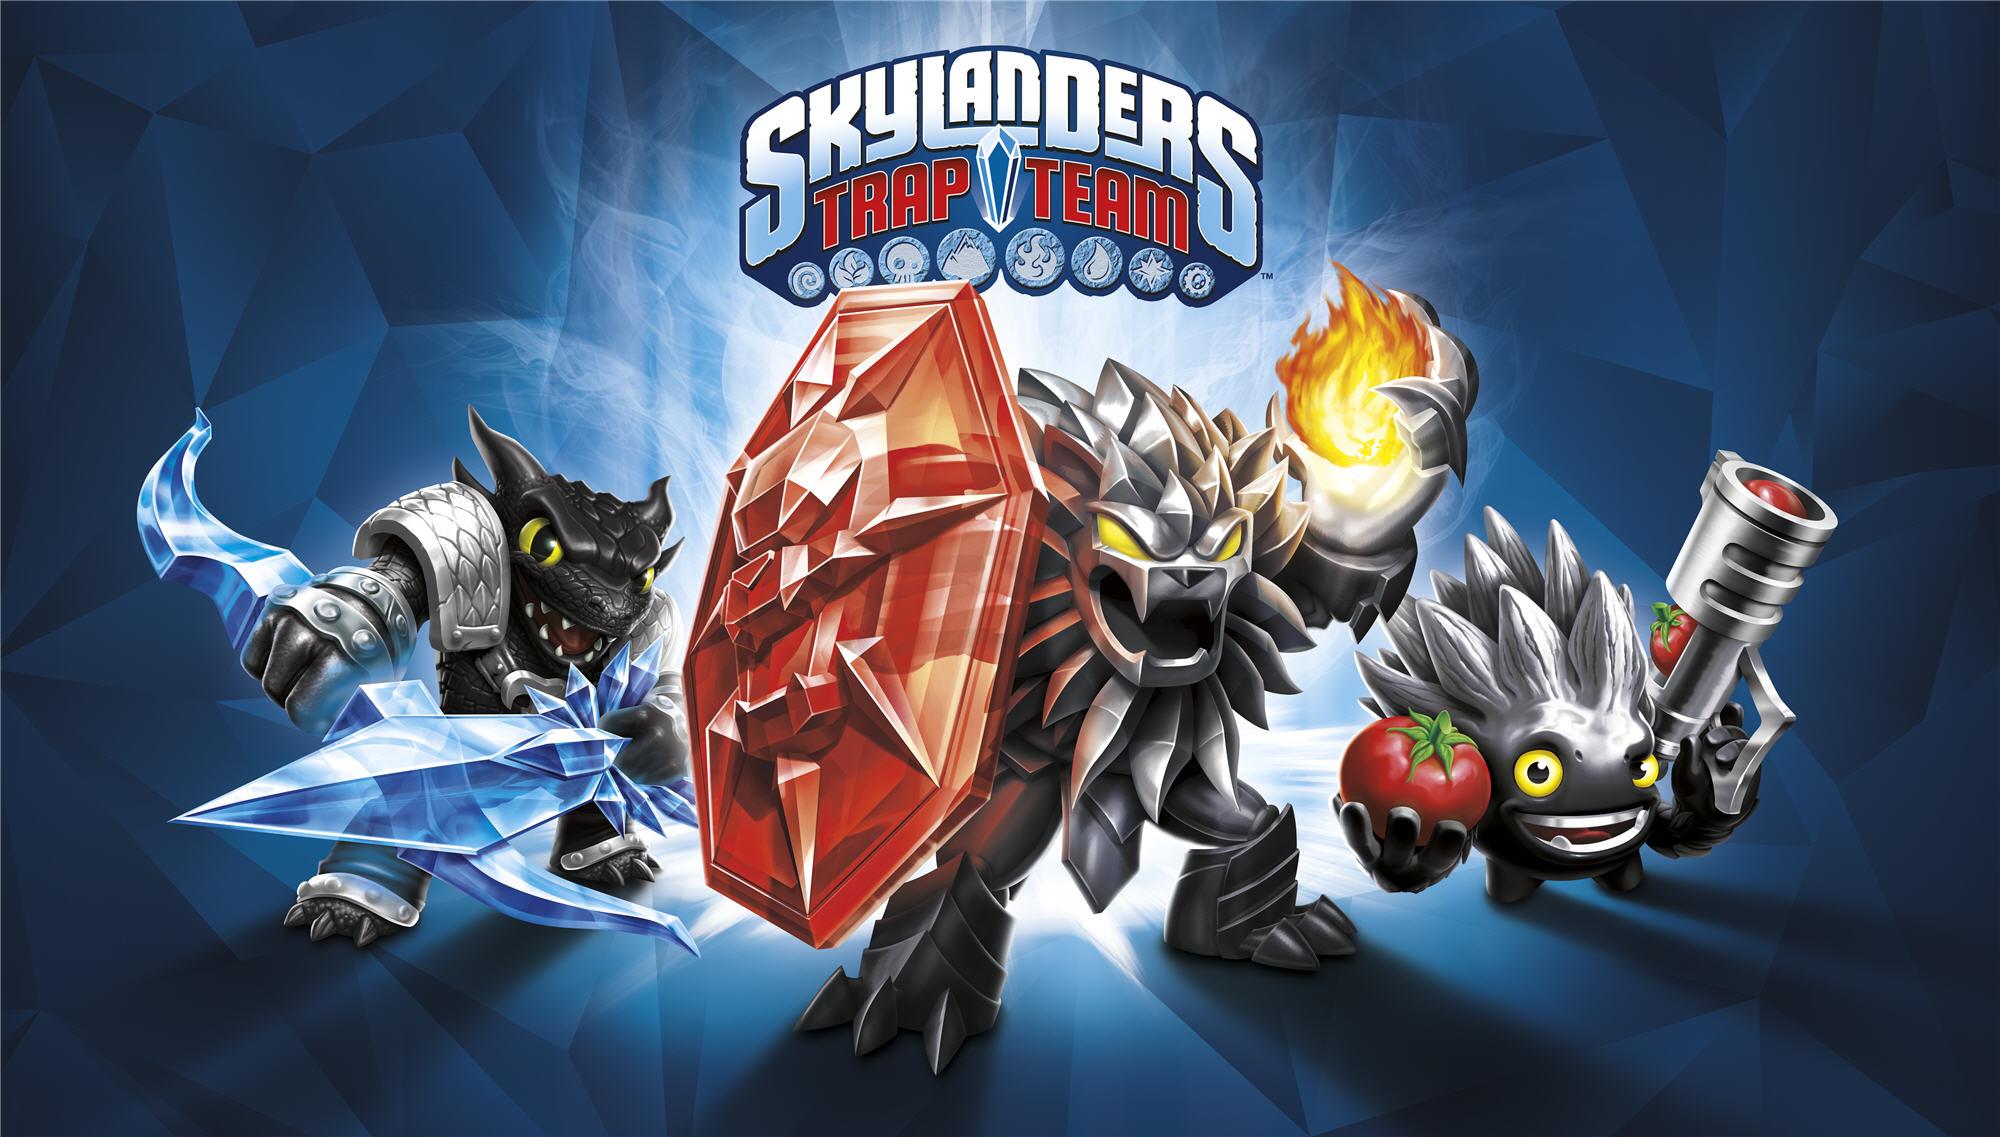 Skylander Invitations was amazing invitations ideas